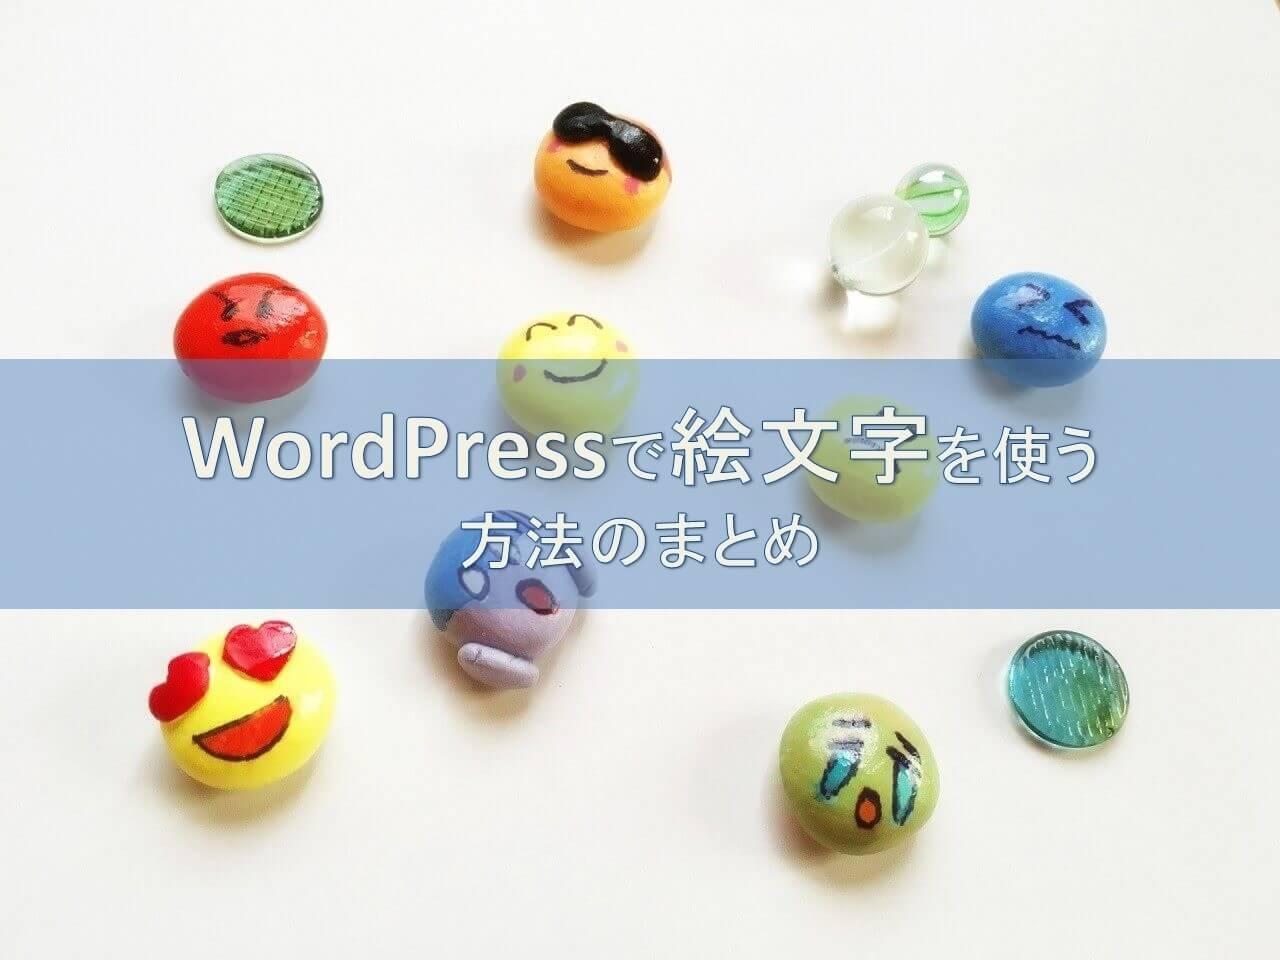 WordPressで絵文字を使う方法のまとめ(絵文字プラグインも紹介)